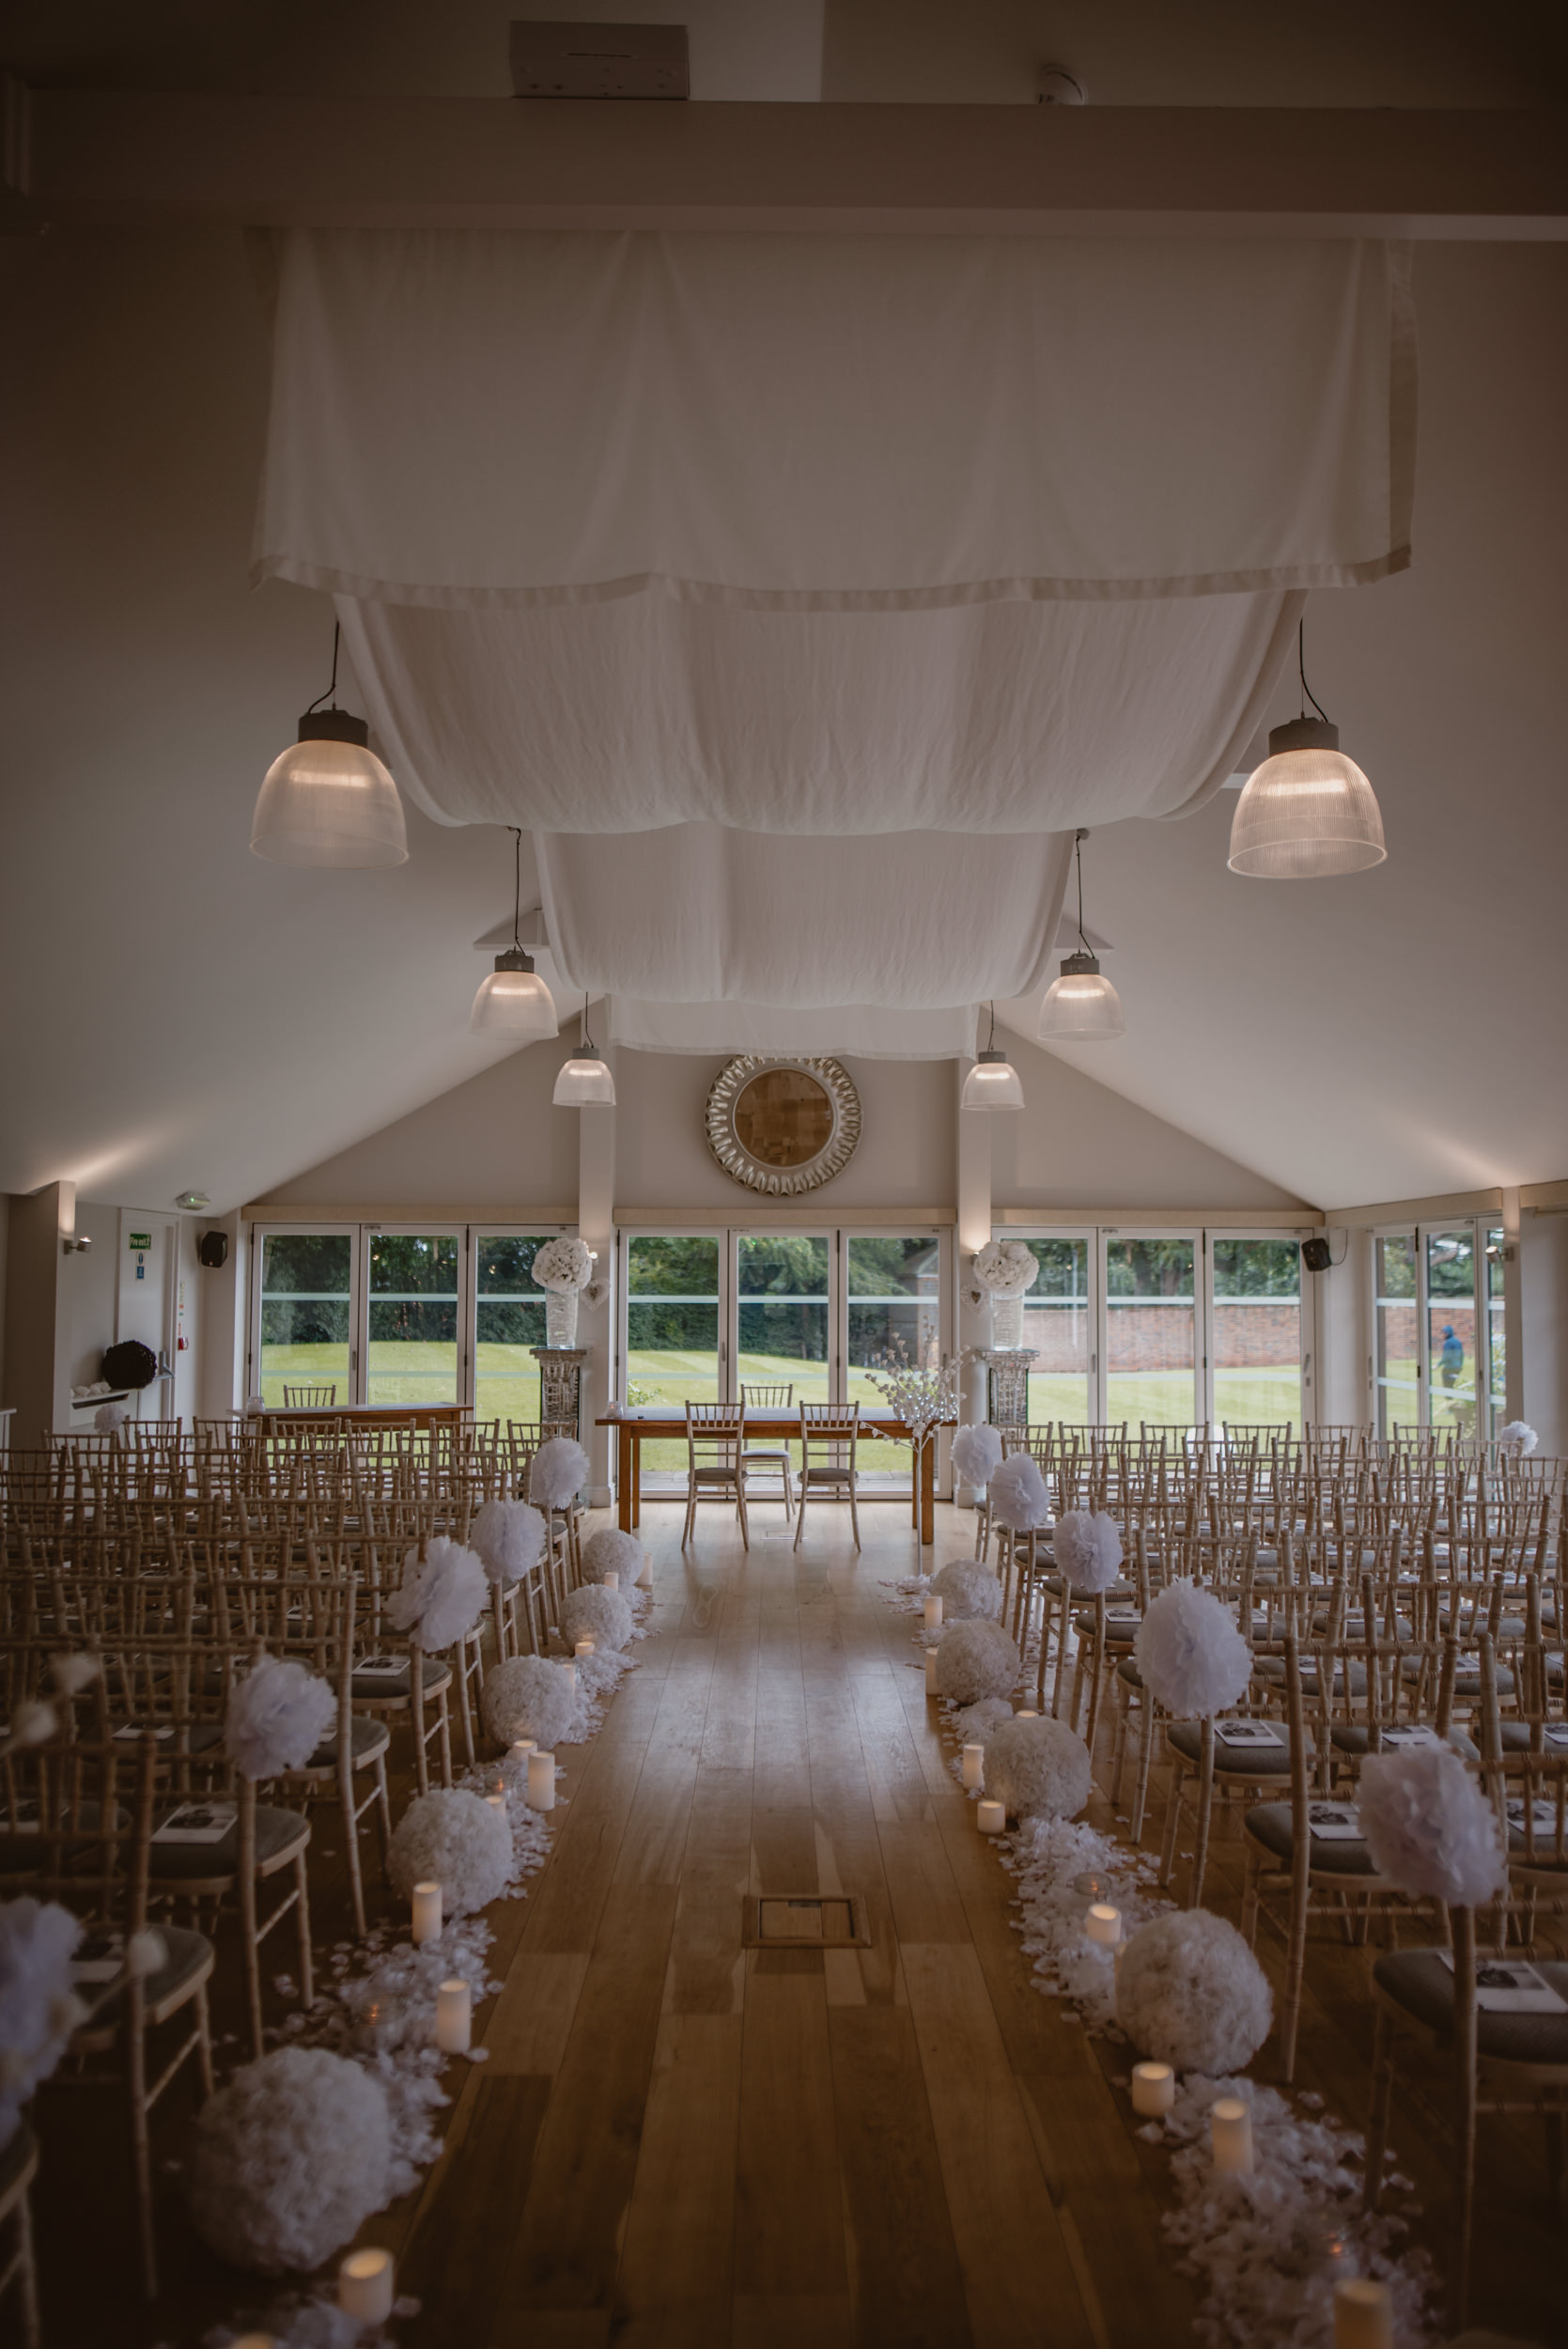 Barry-and-Chaz-wedding-Wasing-Park-Berkshire-Manu-Mendoza-Wedding-Photography-013.jpg